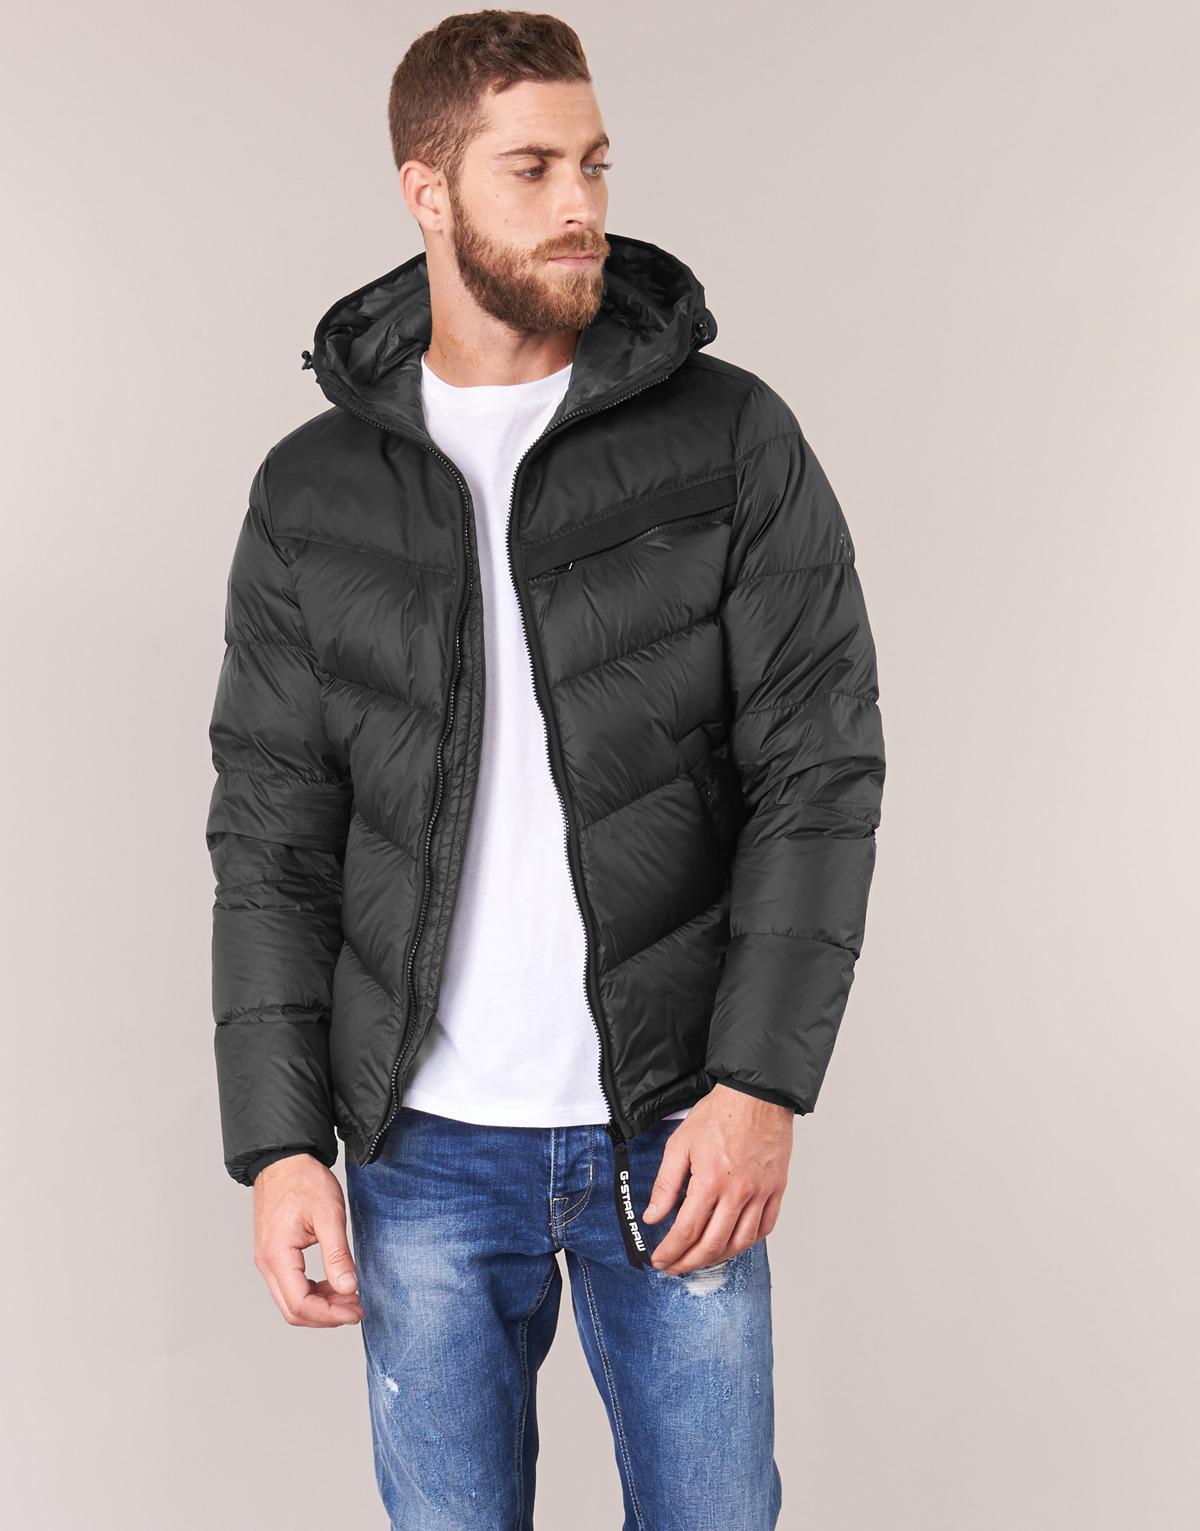 a21ad14858feb G-Star Raw Attacc Qlt Hdd Down Jkt Jacket in Black for Men - Lyst